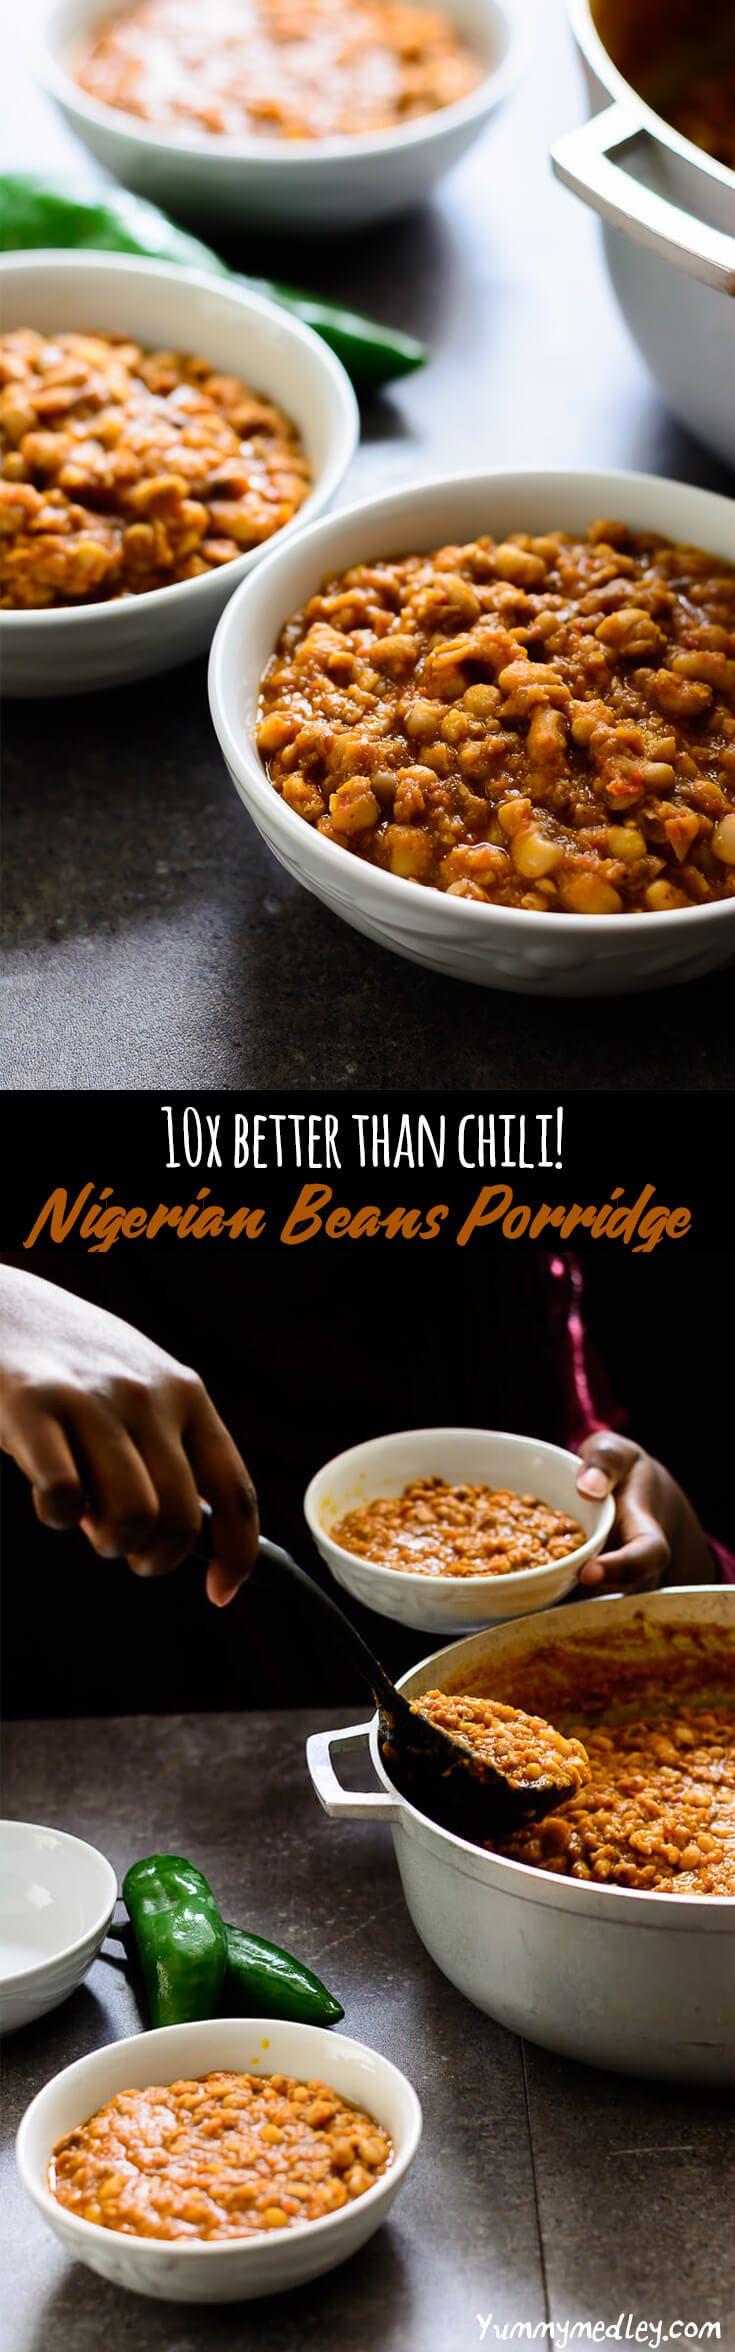 Nigerian Beans Porridge Recipe Food, Food recipes